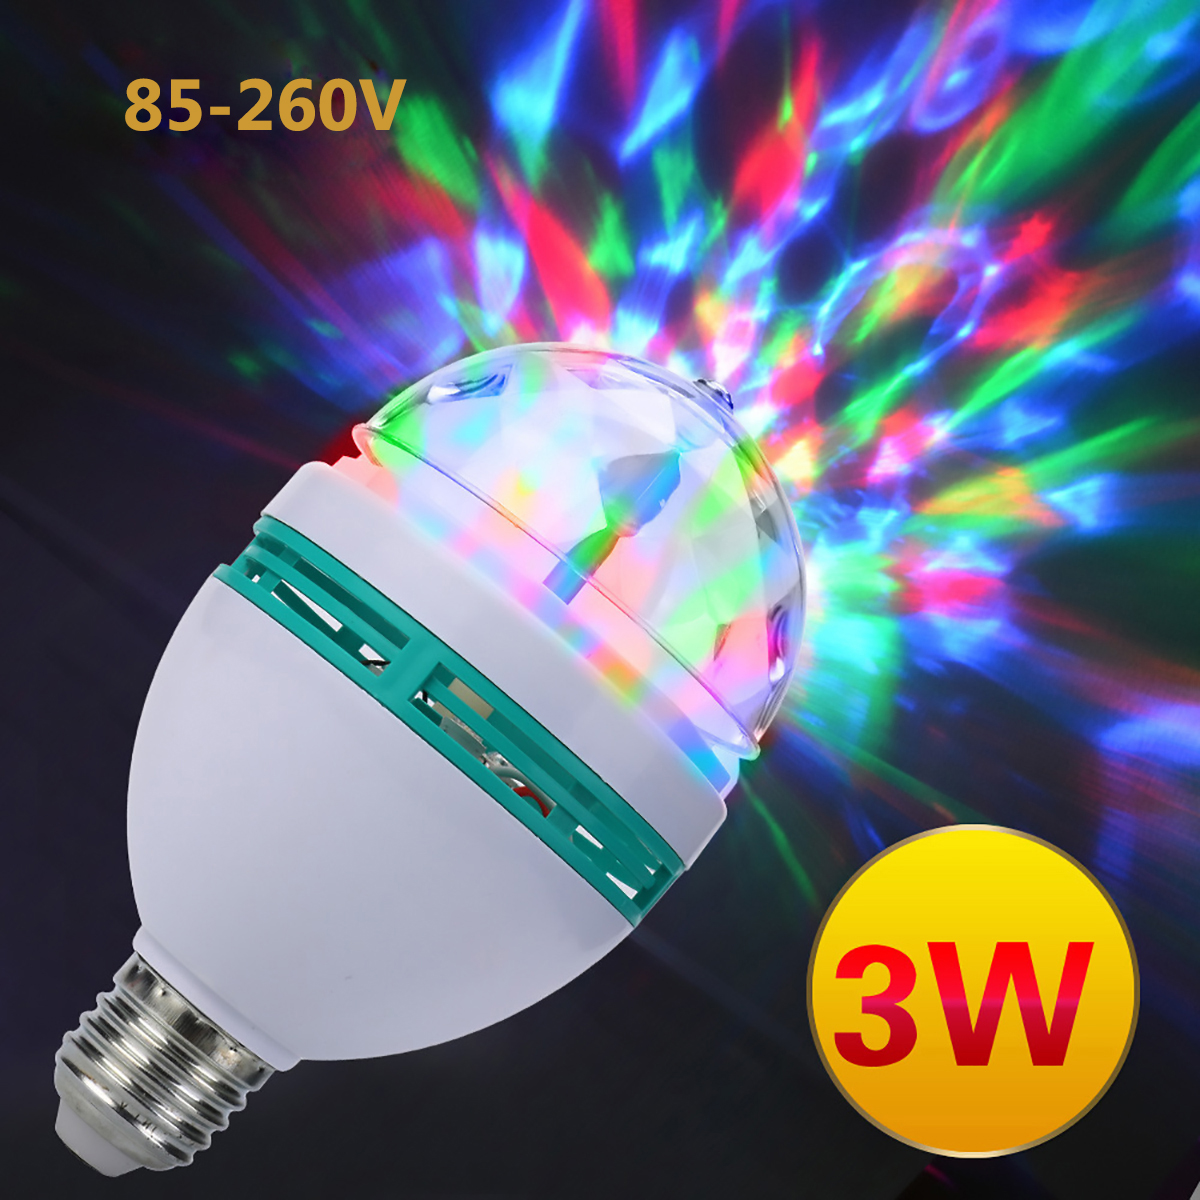 3W E27 RGB Lamp LED Bulb Light AC85-260V Colorful Auto Rotating RGB LED Bulb Stage Light Disco DJ Party Bar Decoration Lighting